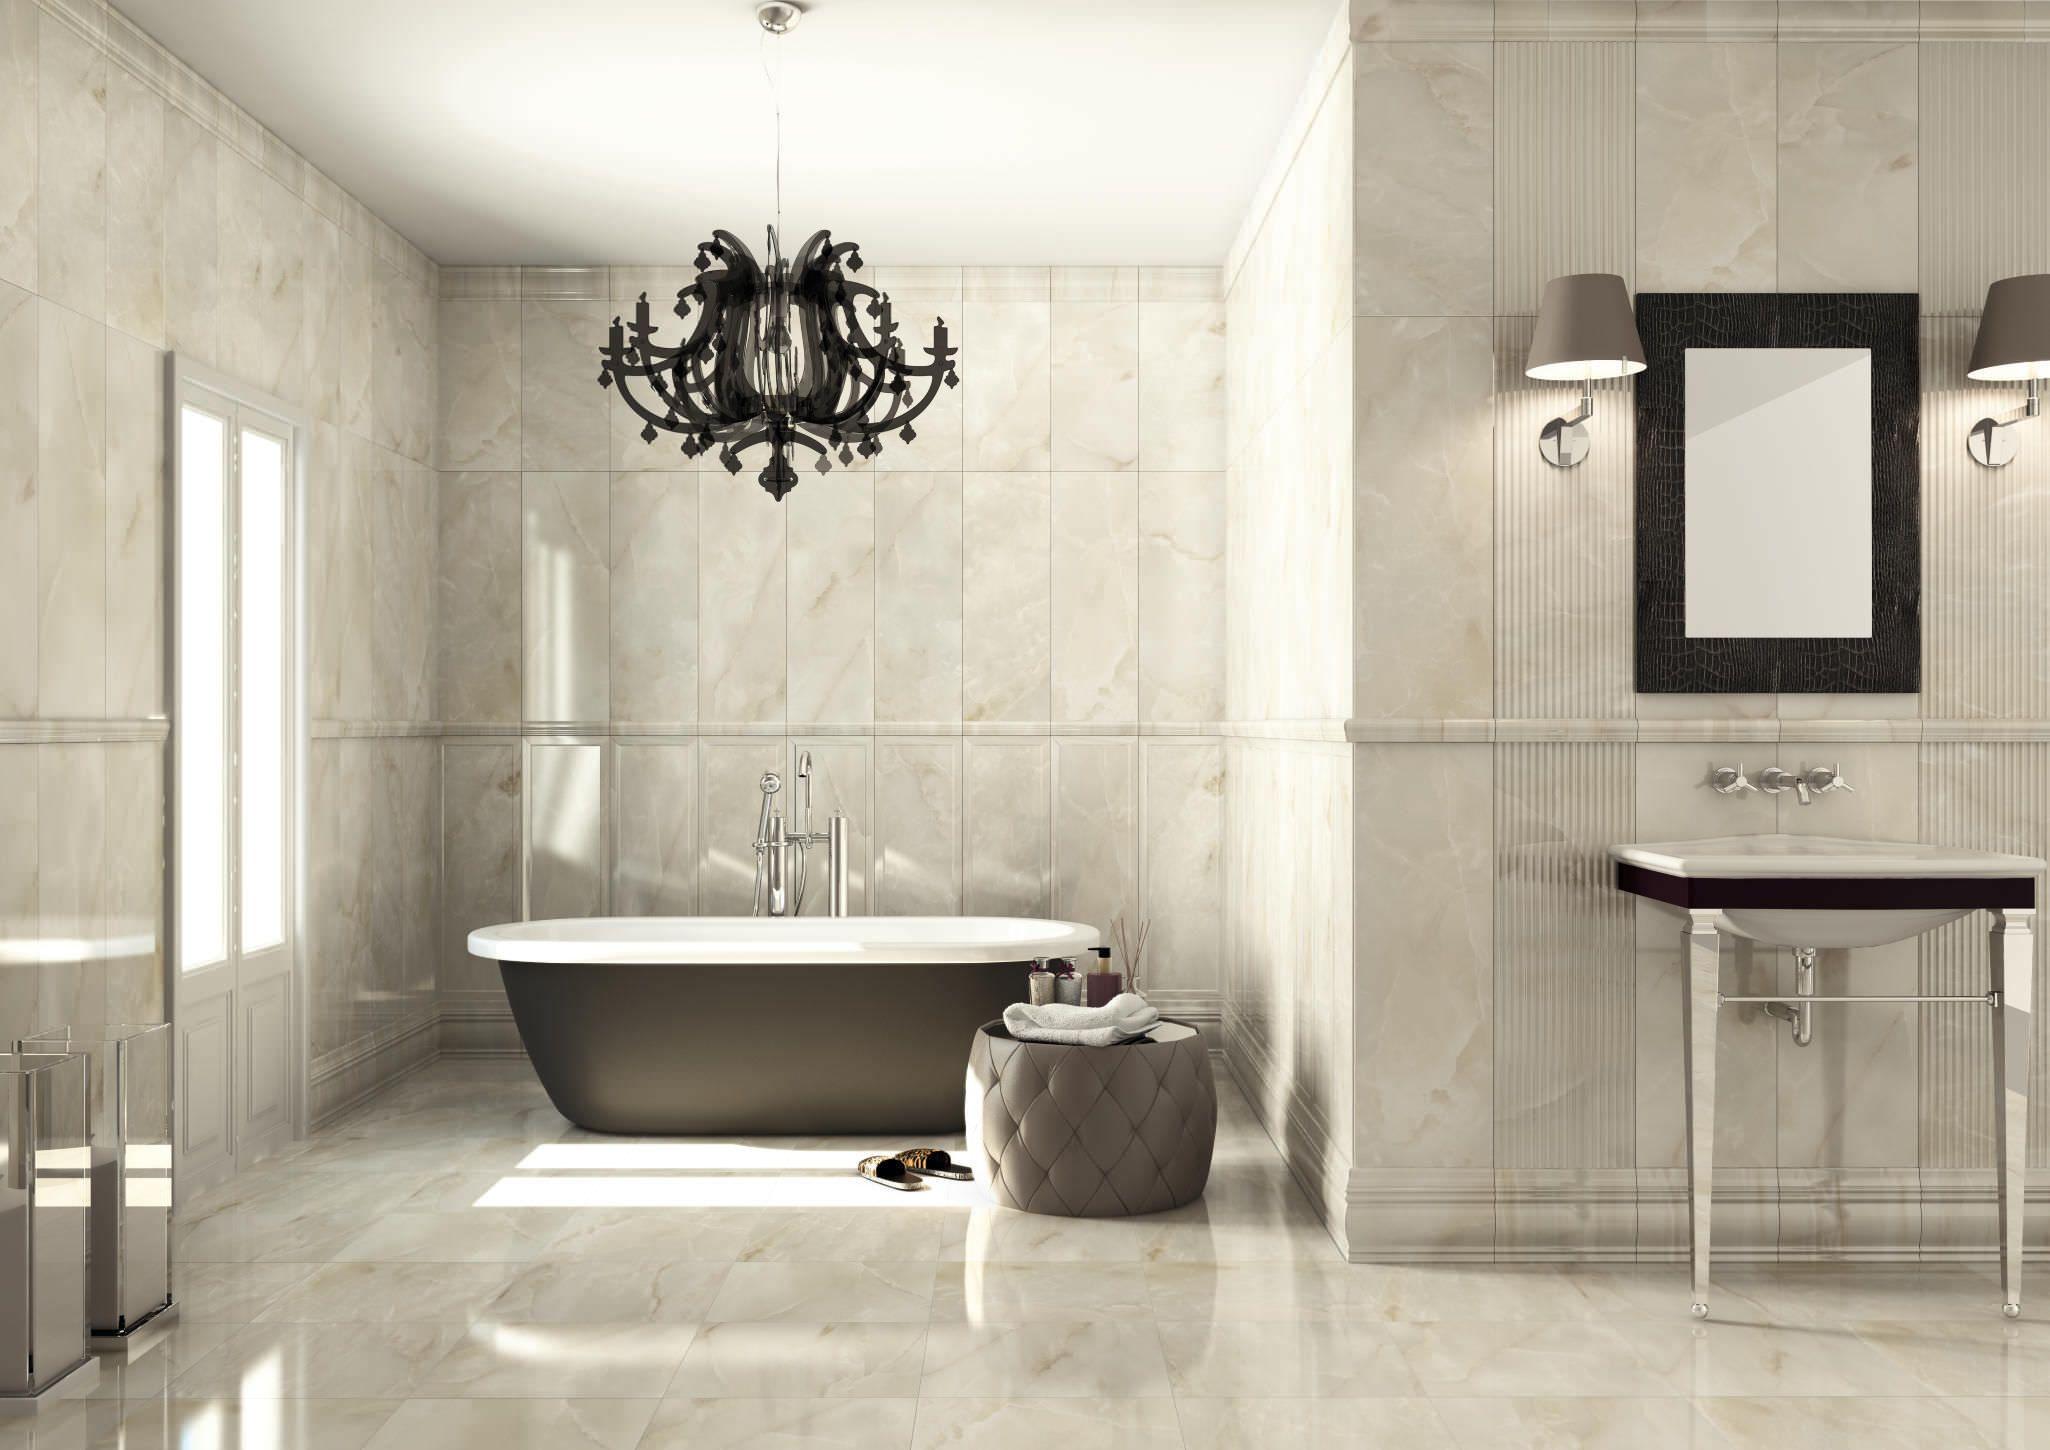 Good Looking White Mosaic Gloss Granite Bathroom Floor Tile Ideas And Free Standing Bath Under Modernes Badezimmer Modernes Badezimmerdesign Badezimmer Gunstig